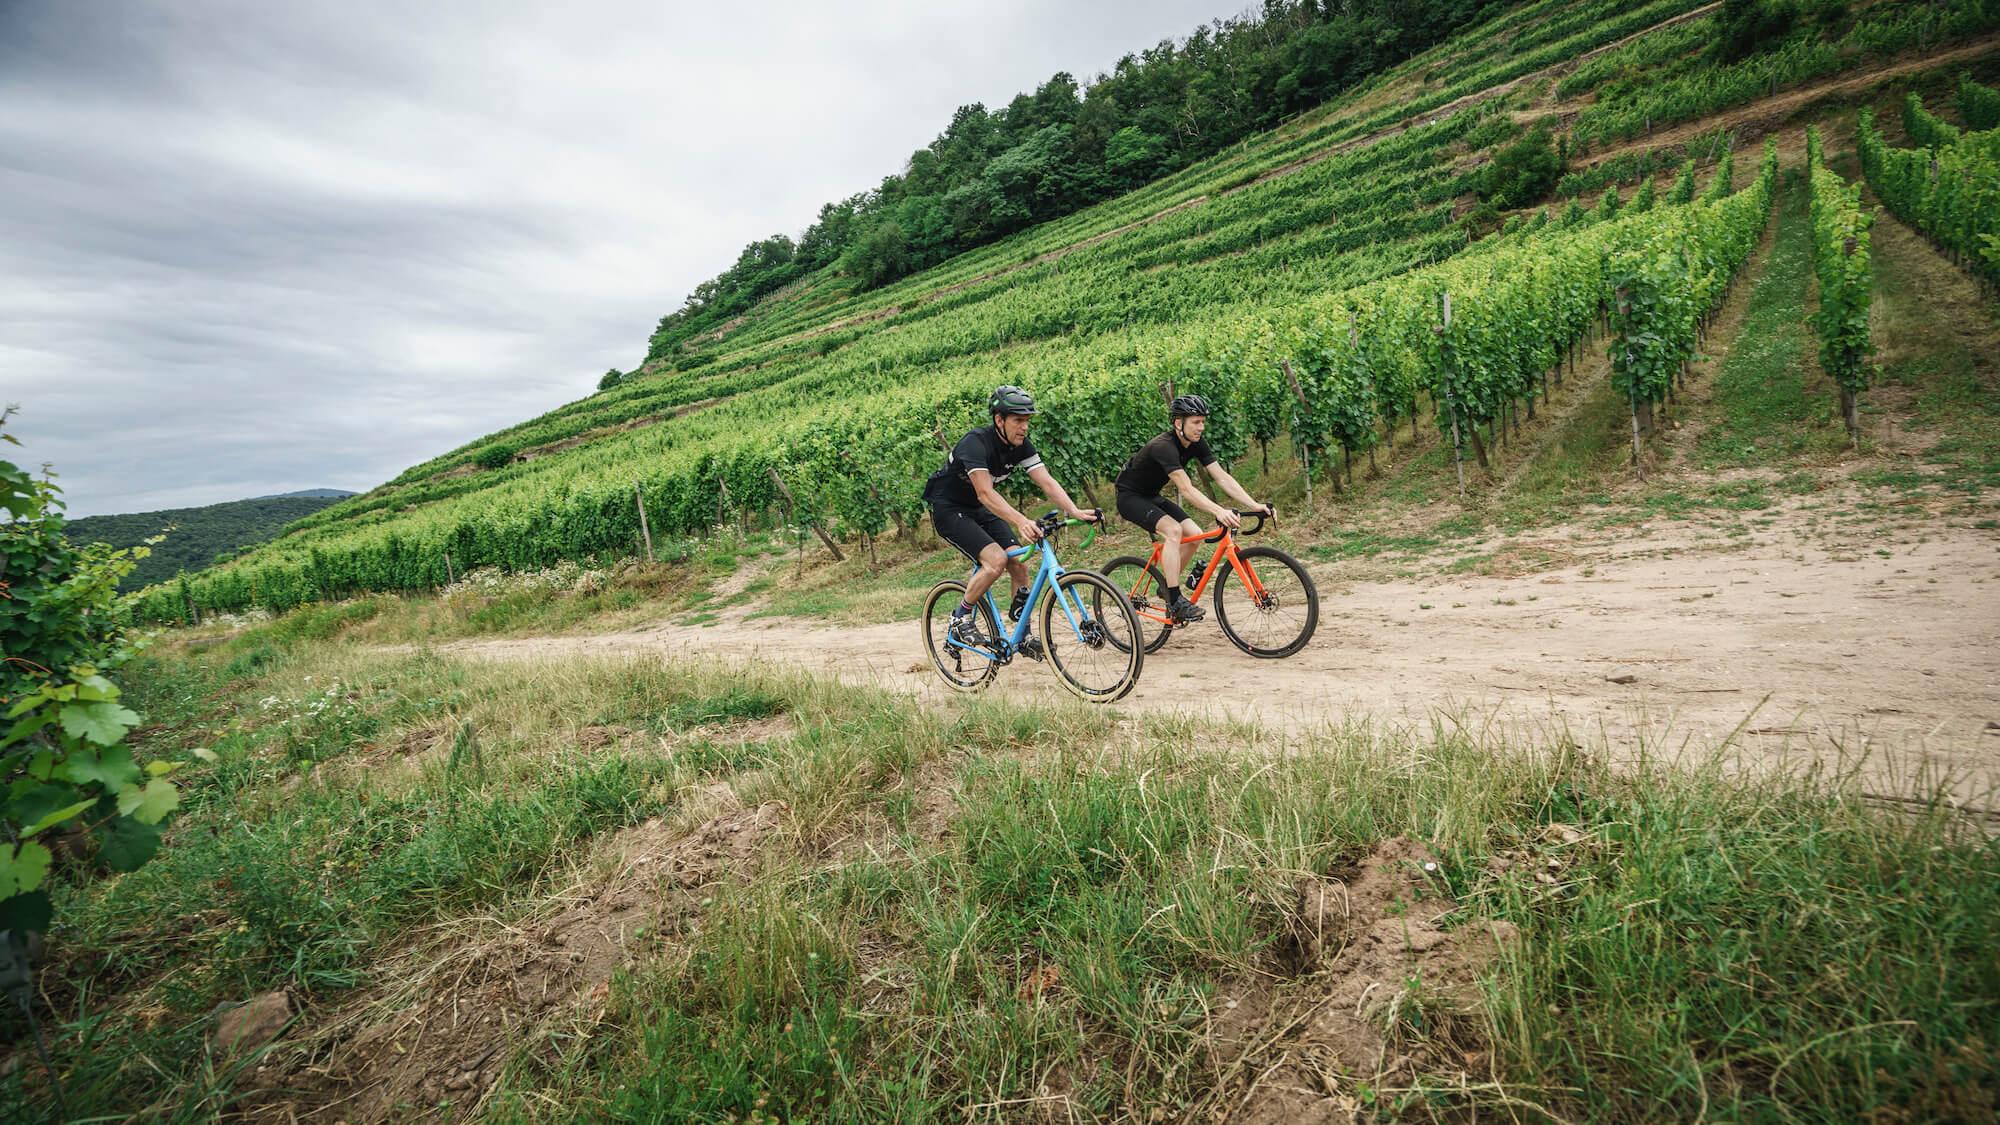 Gravel biciklik suhannak a domboldalon